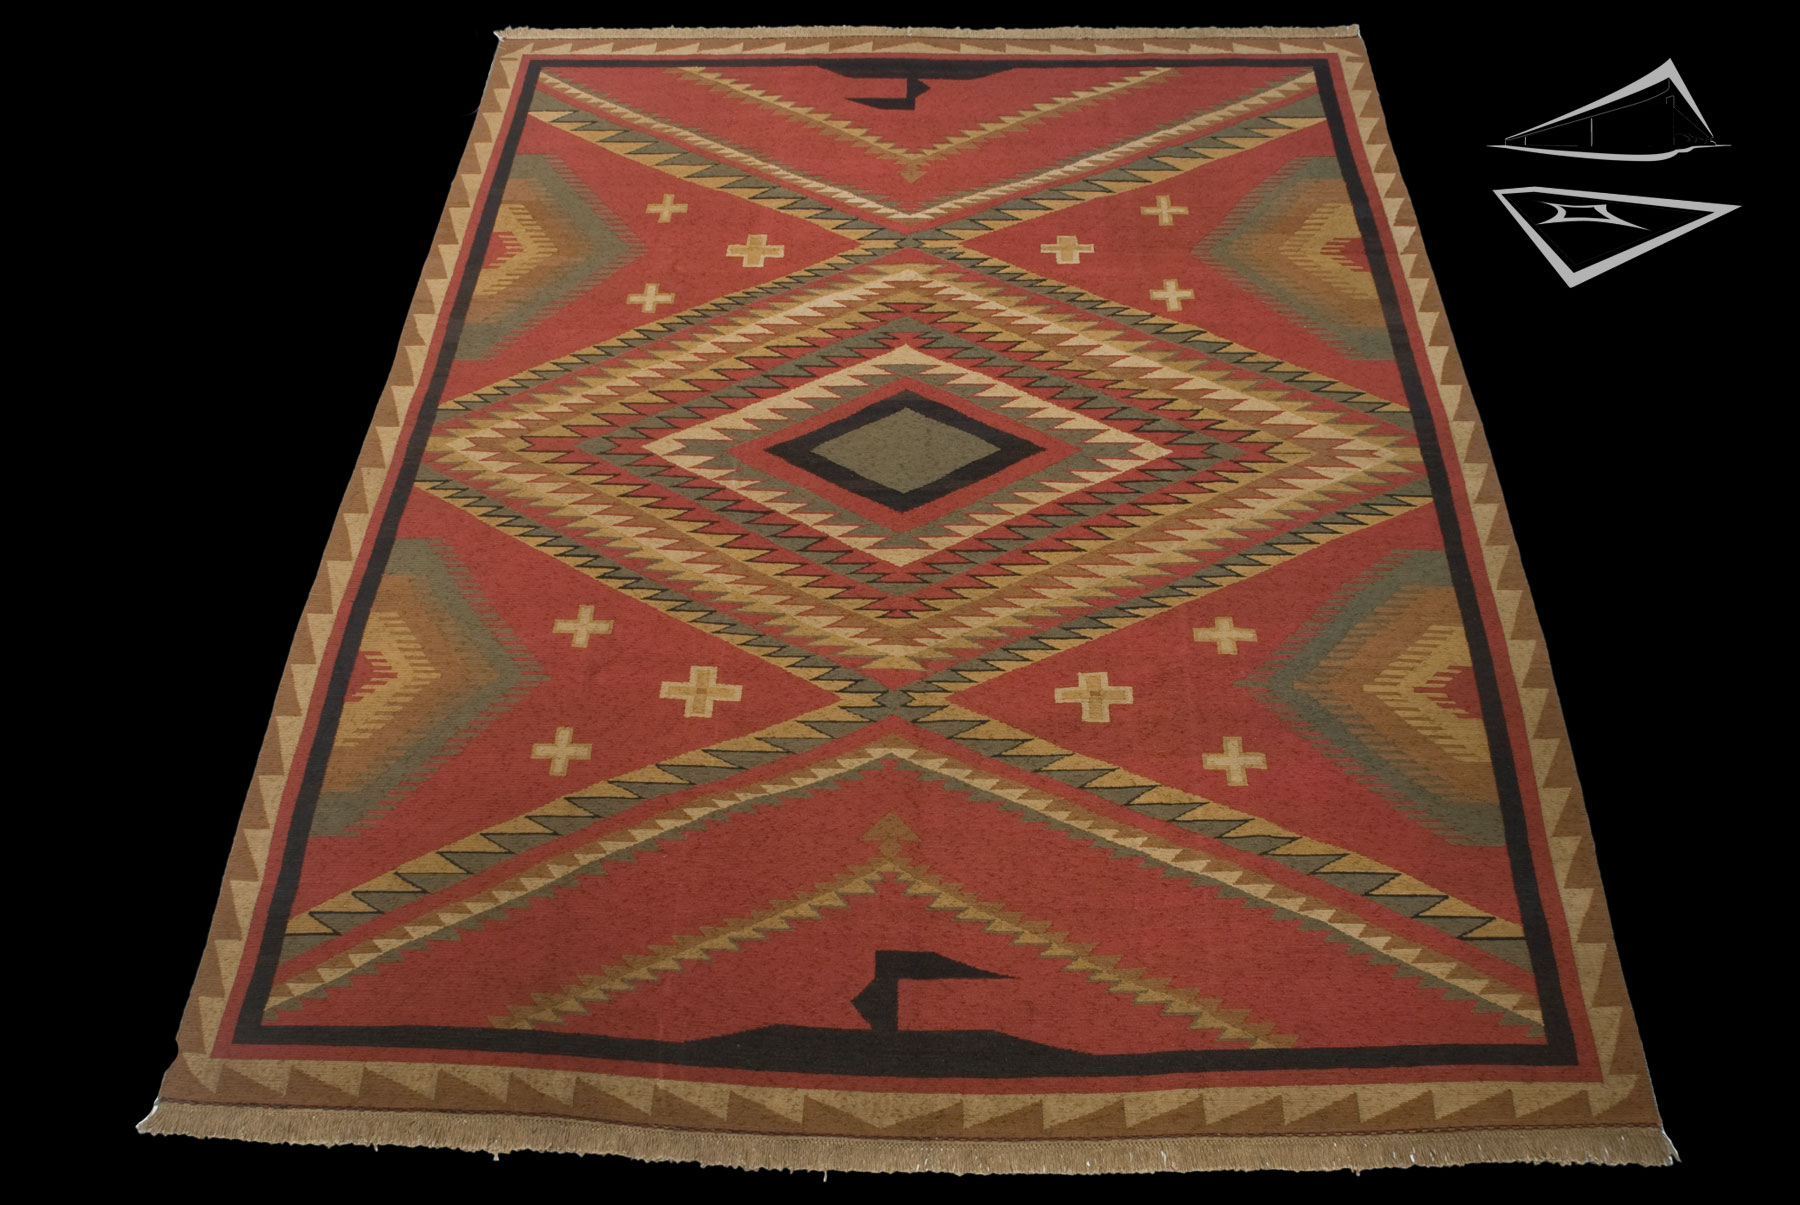 soumac rug 10 39 x 13 39. Black Bedroom Furniture Sets. Home Design Ideas